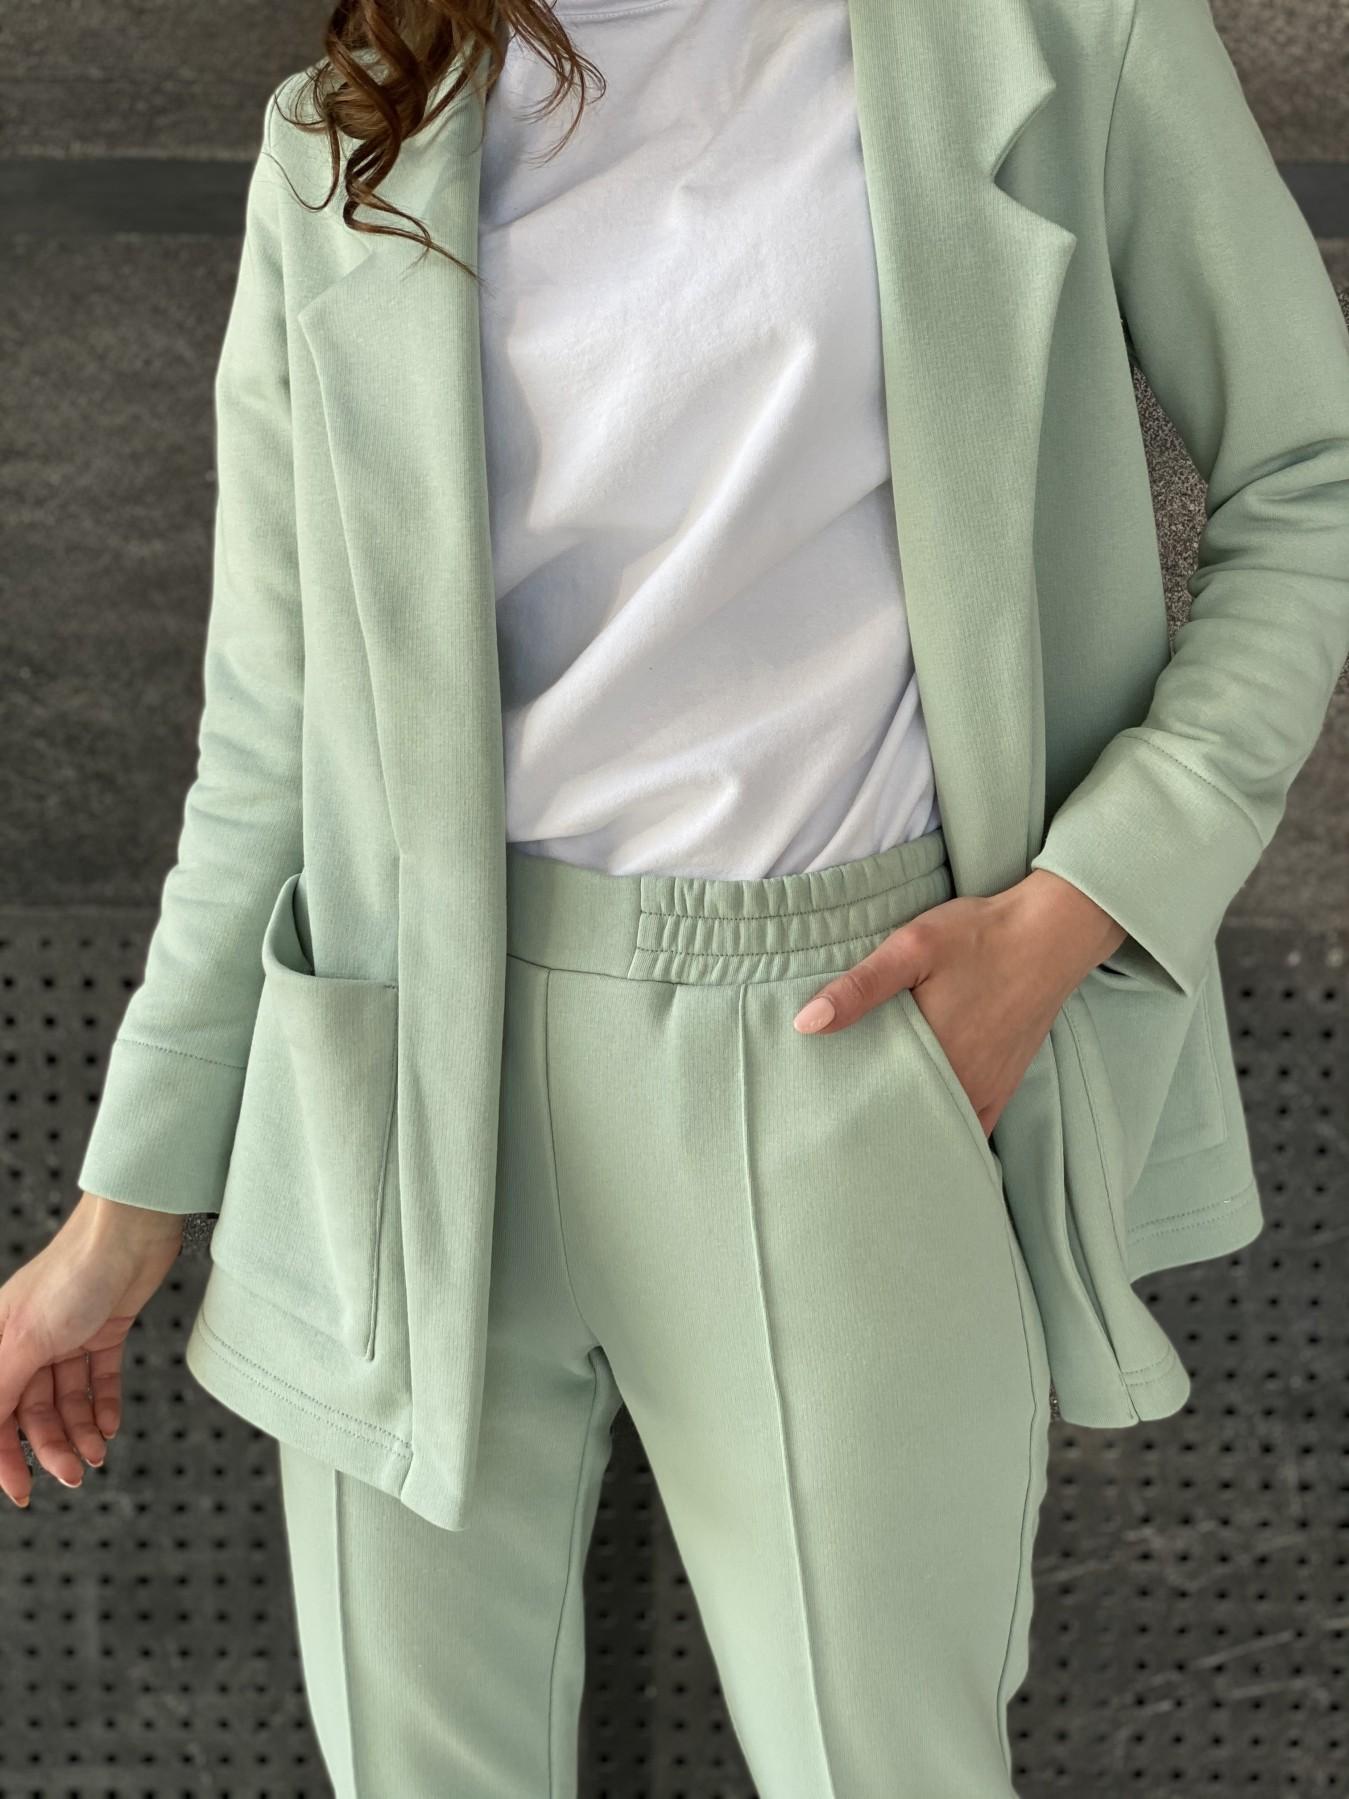 Аурис костюм трикотажный из  3х нитки 11083 АРТ. 47578 Цвет: Олива Светлая - фото 5, интернет магазин tm-modus.ru